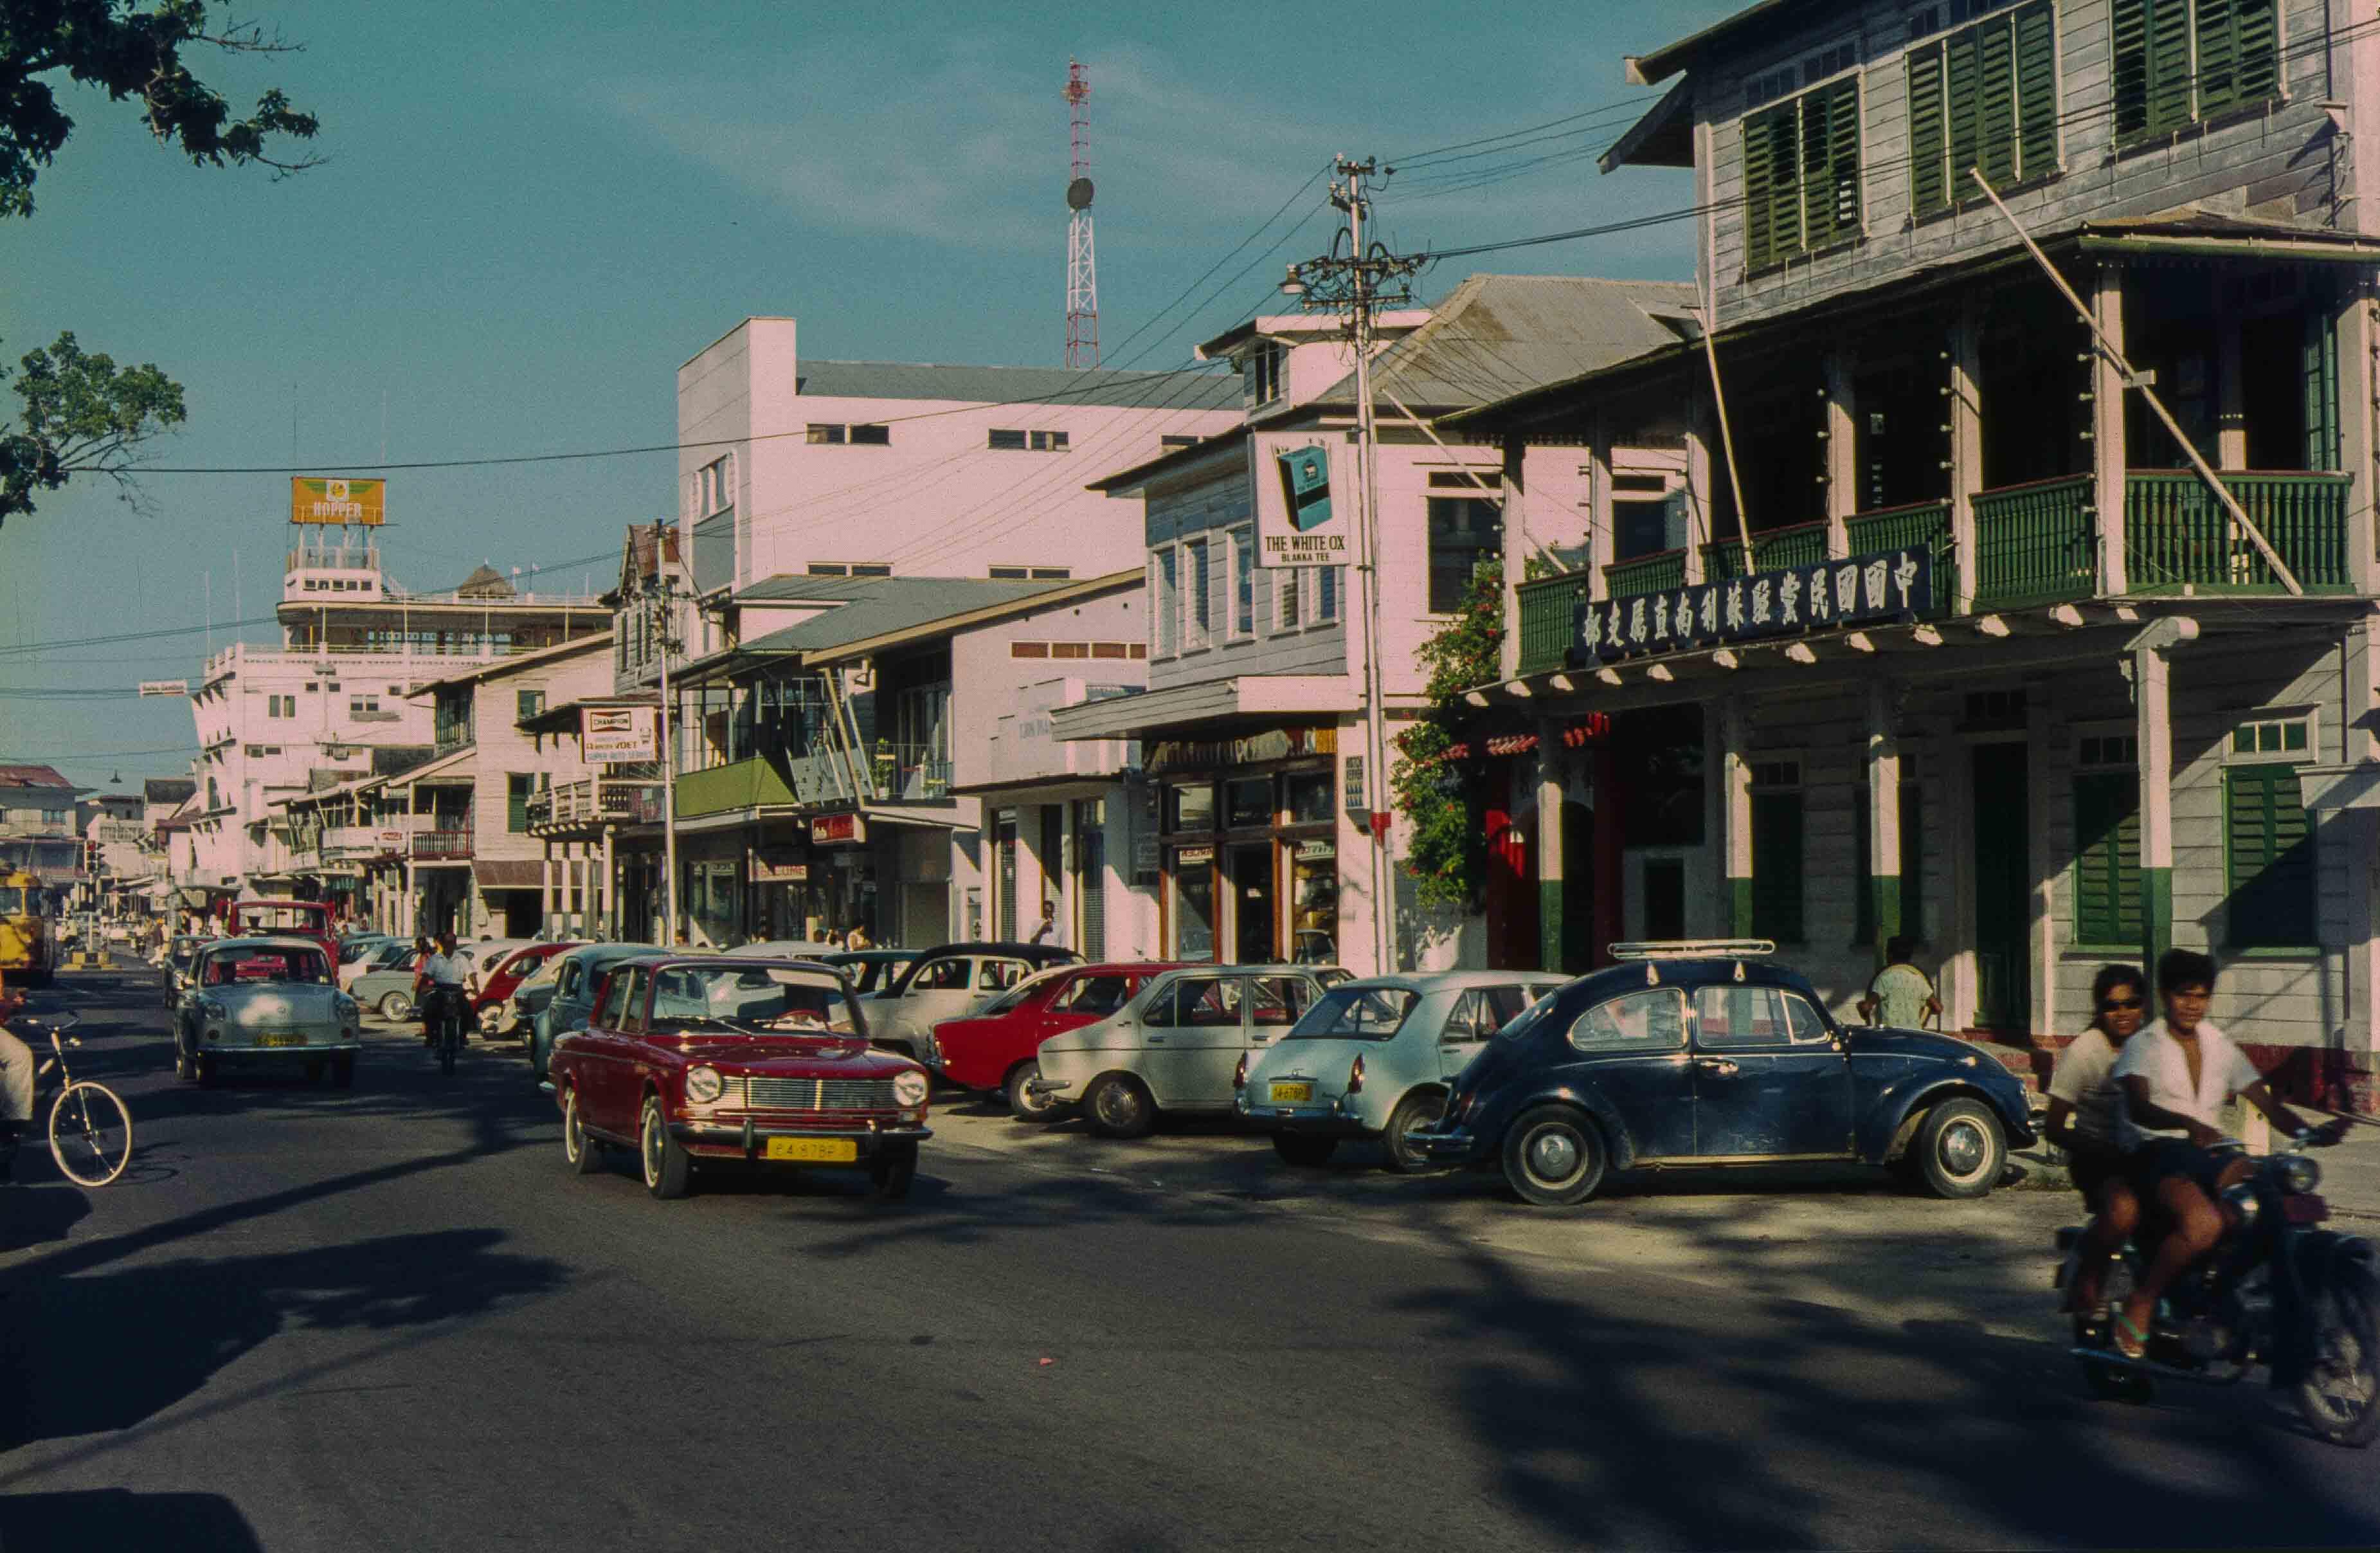 153. Suriname